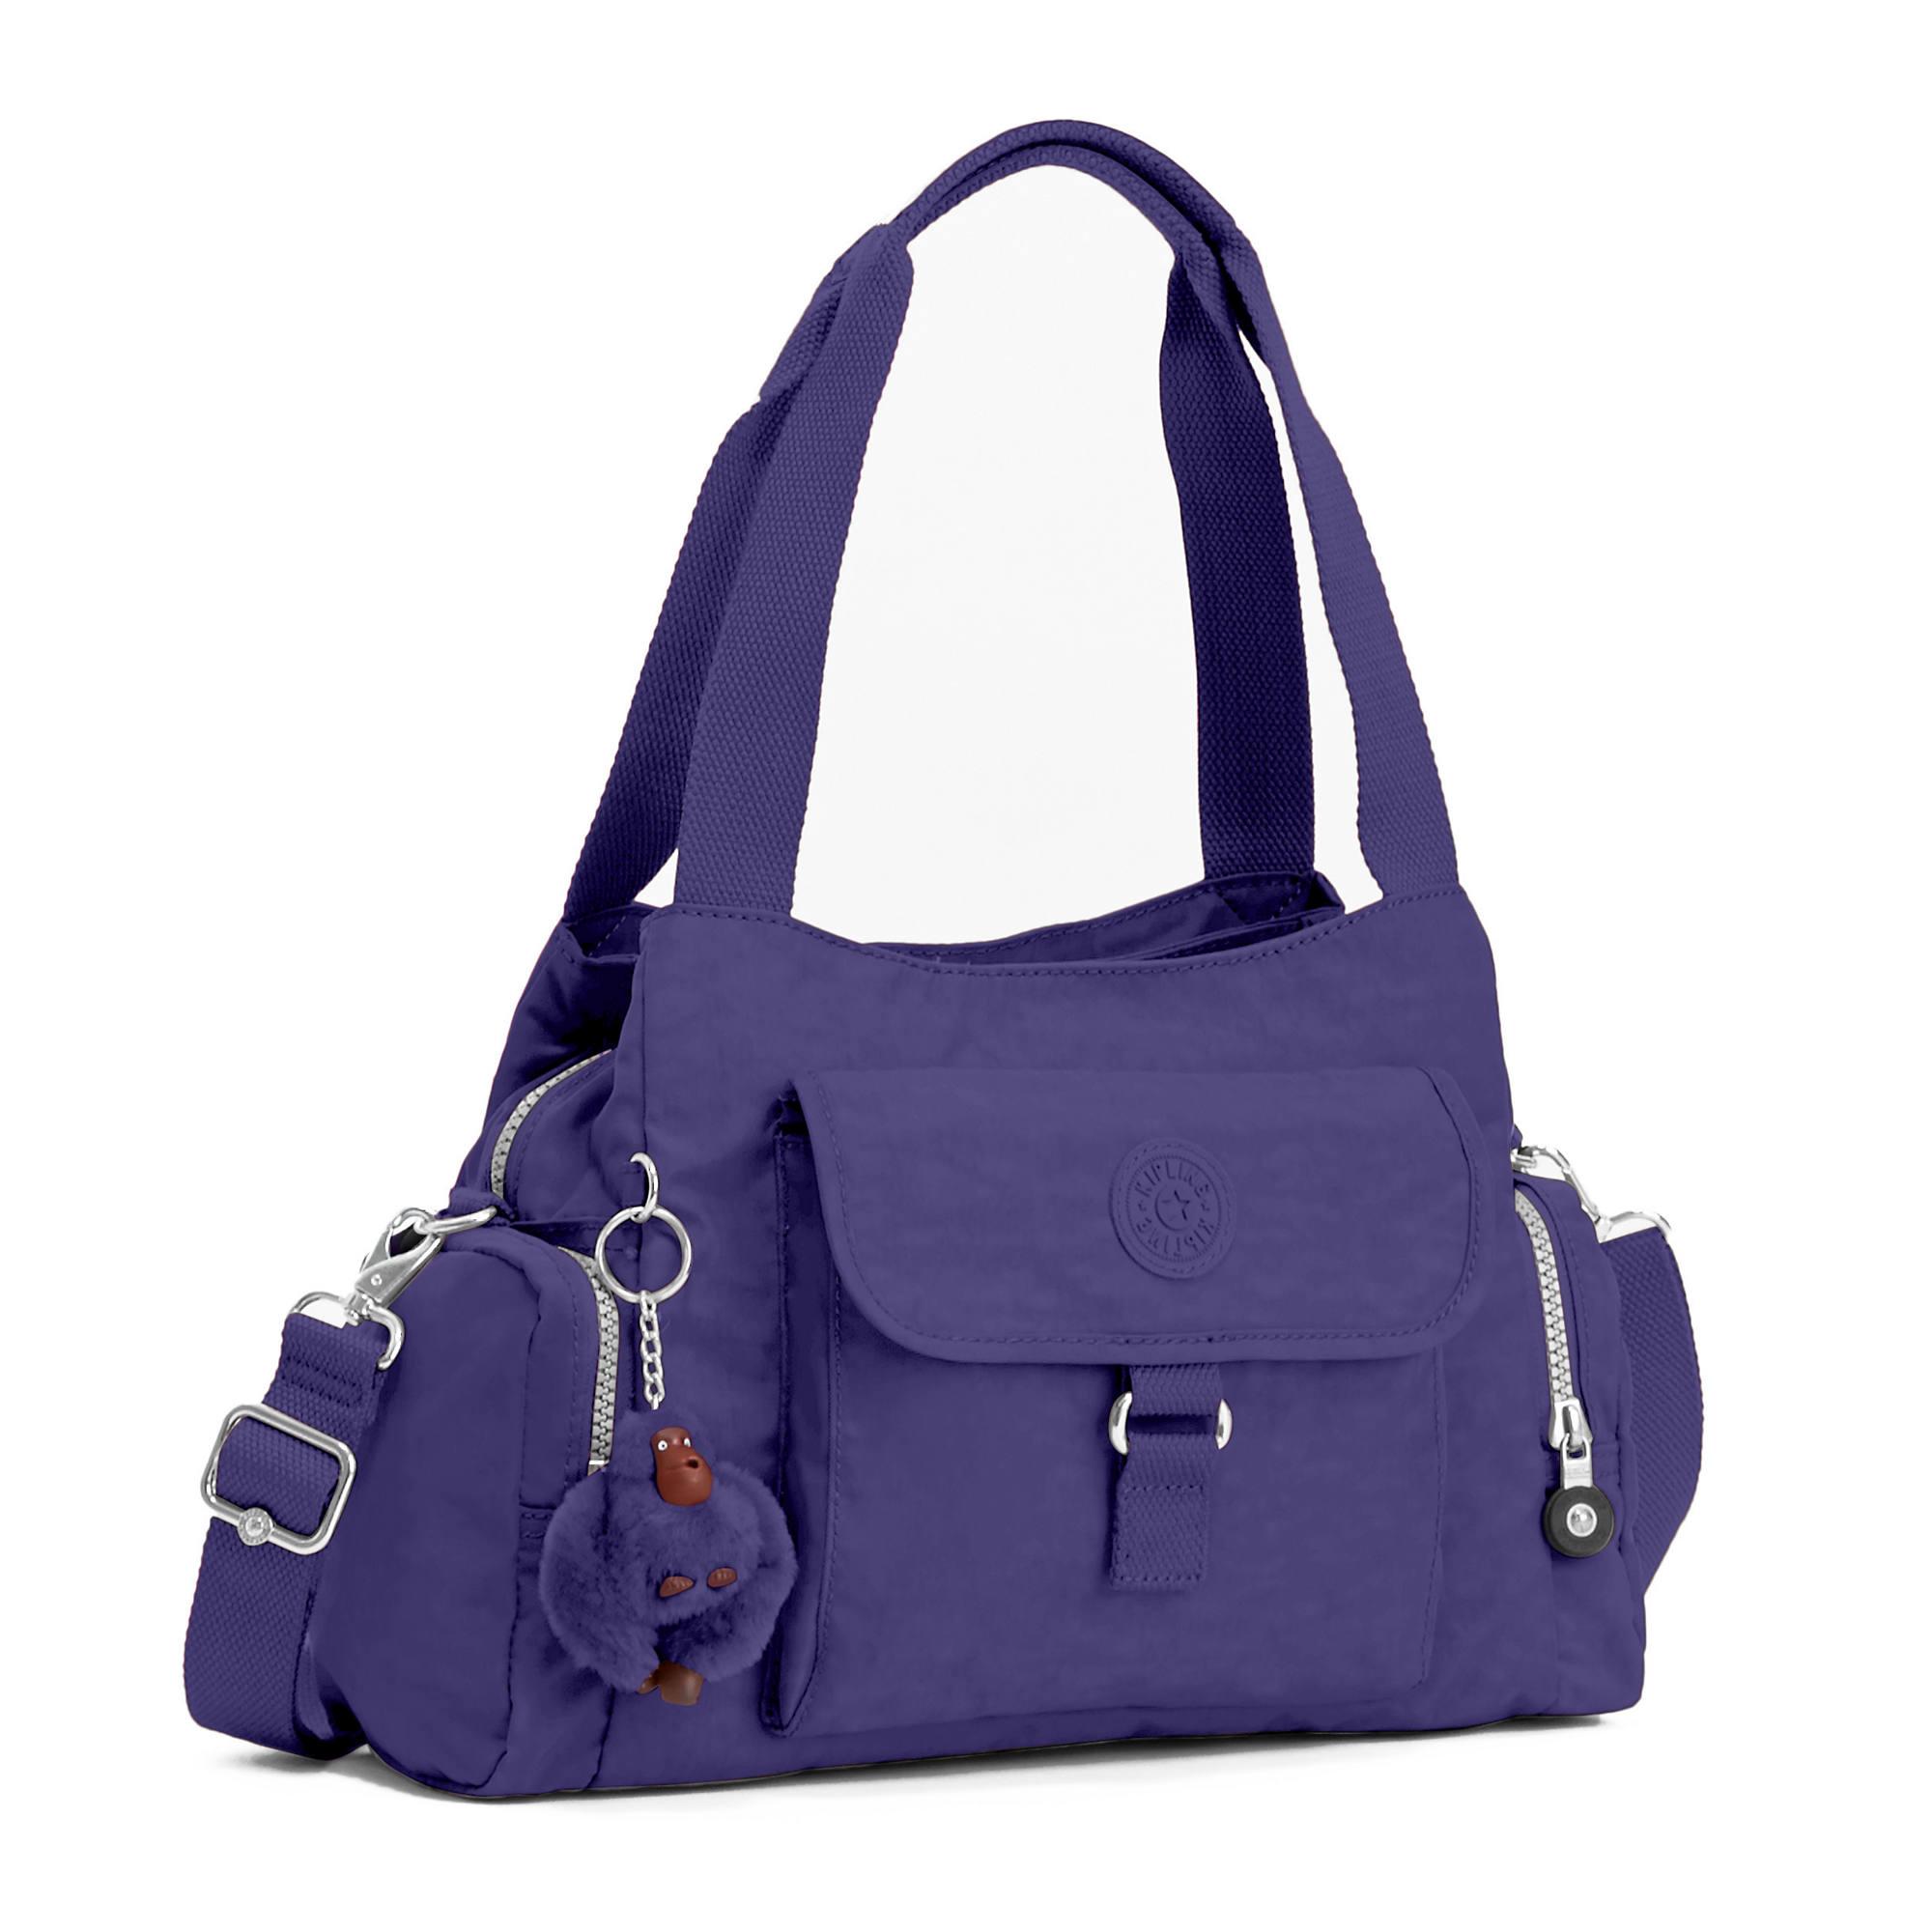 Kipling-Felix-Large-Handbag miniature 5